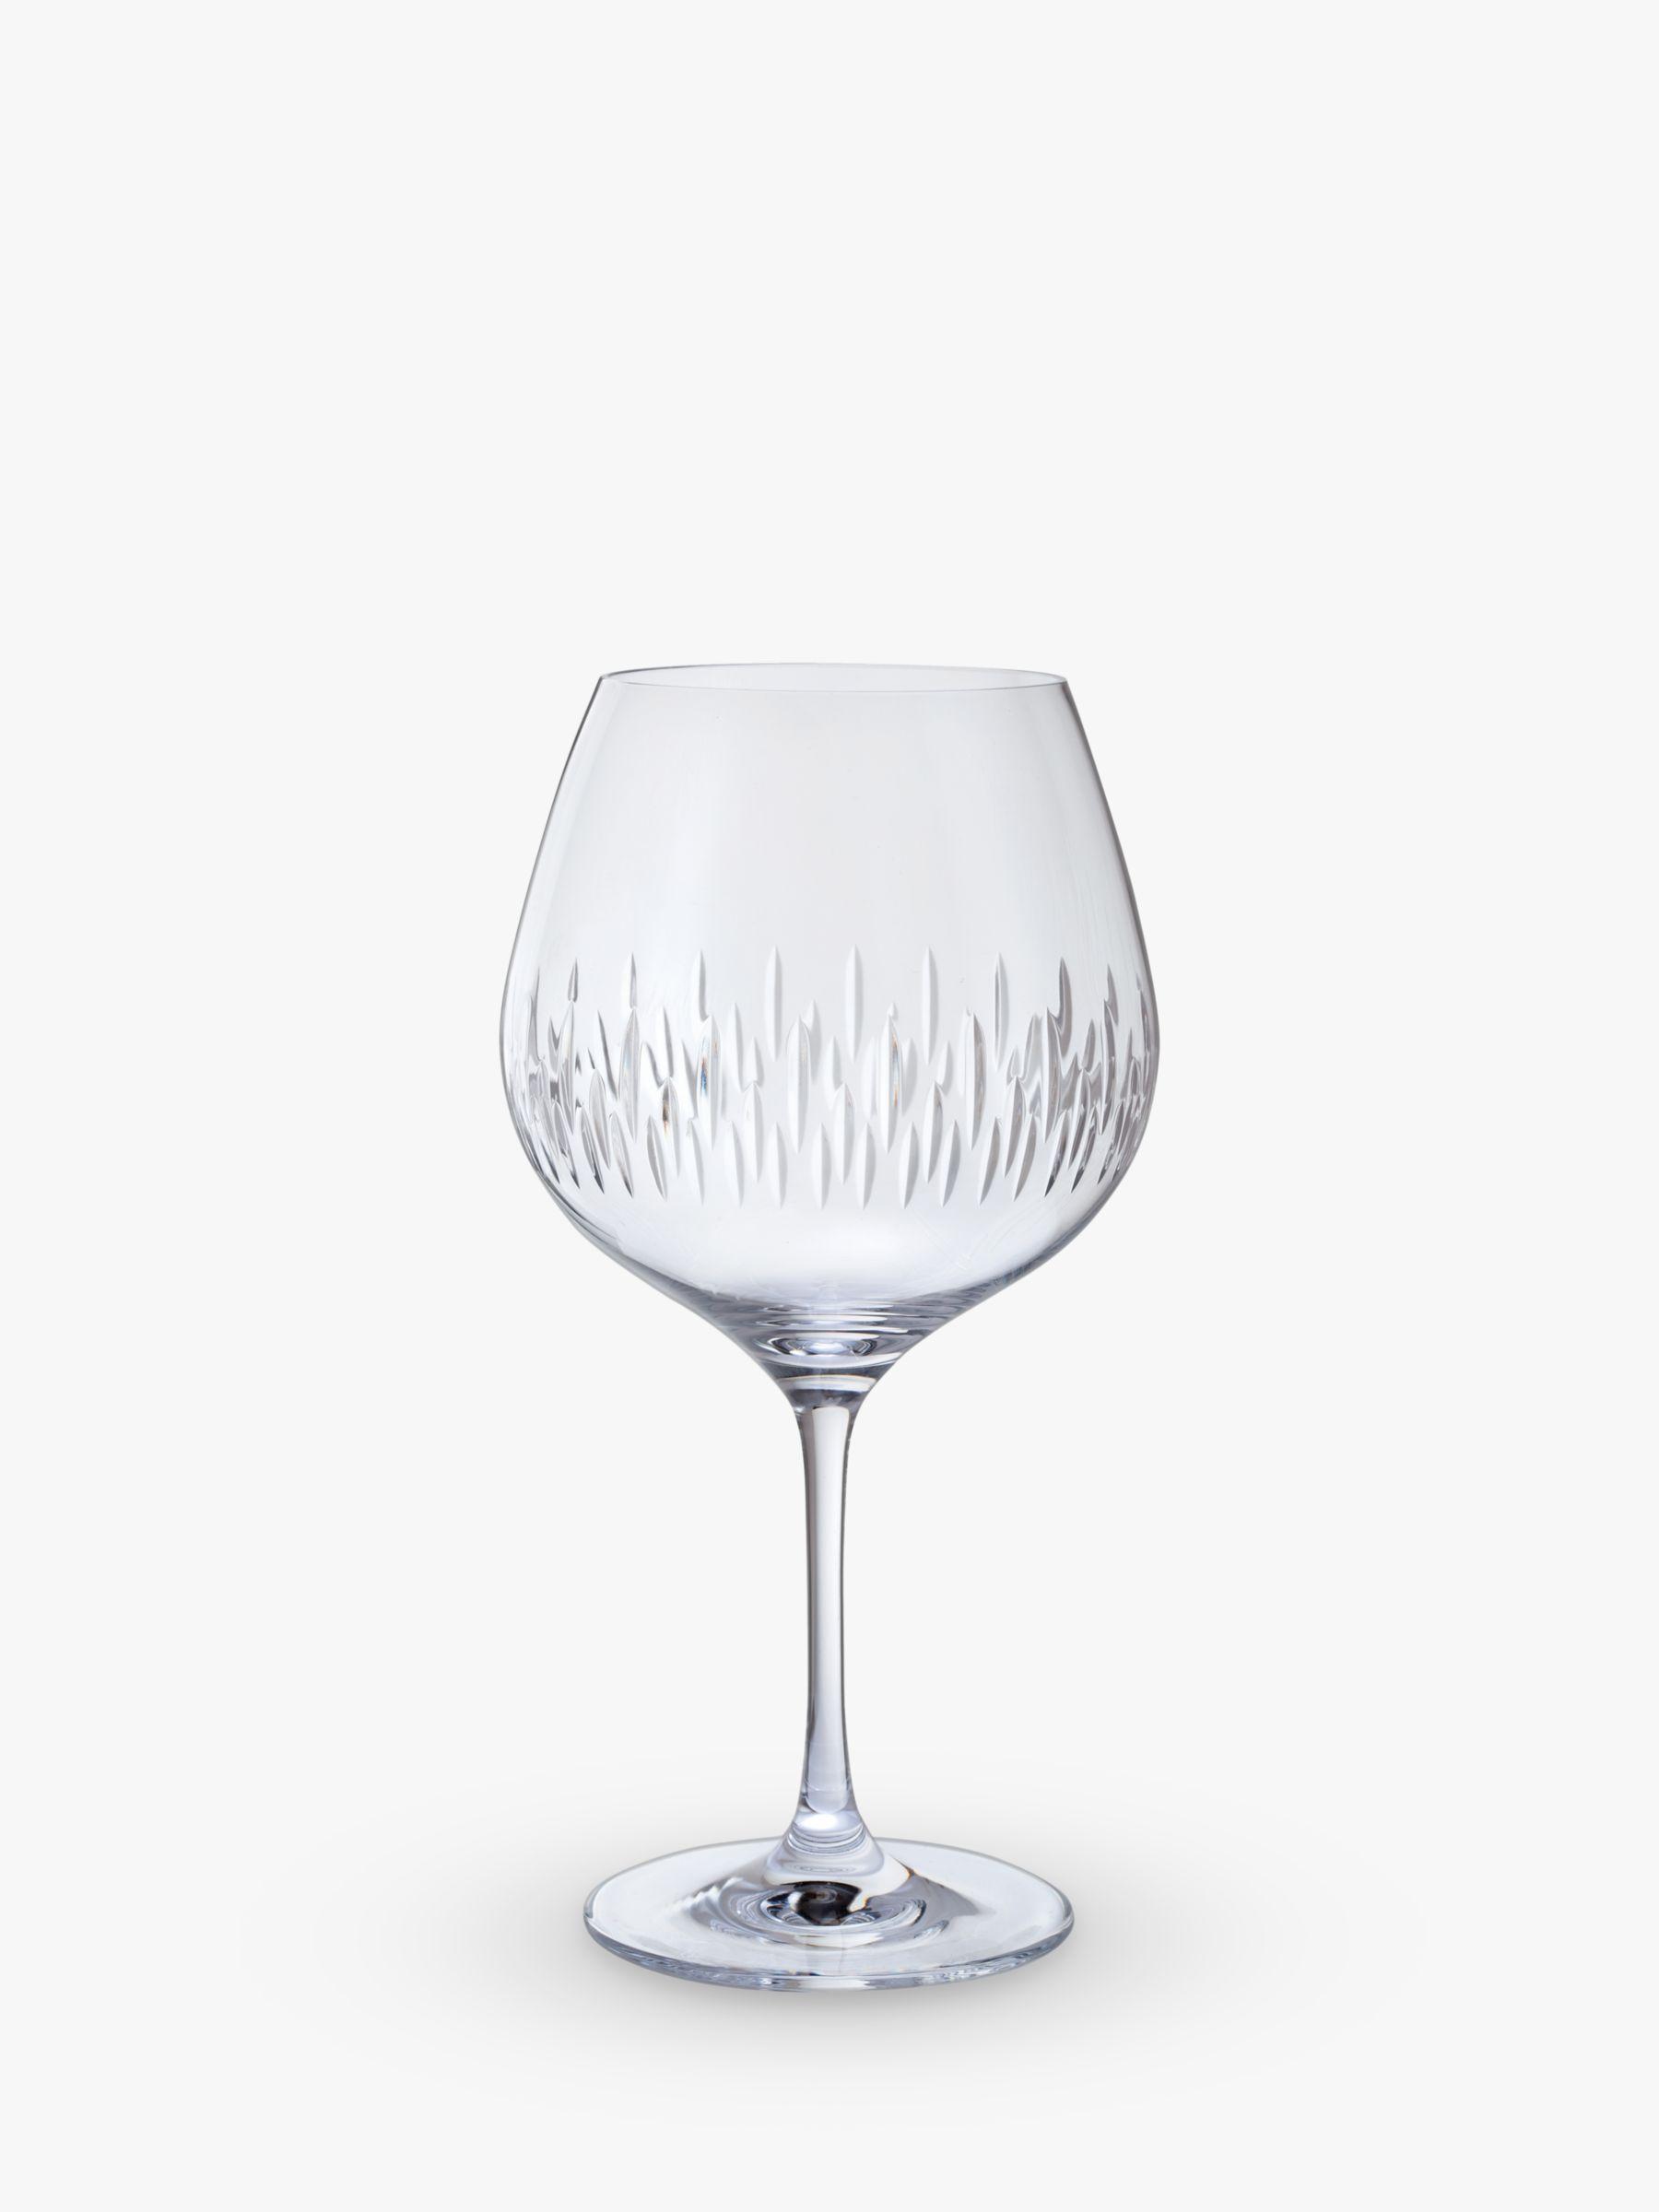 Dartington Crystal Dartington Crystal Limelight Cut Glass Gin Copa Glasses, Set of 2, 610ml, Clear